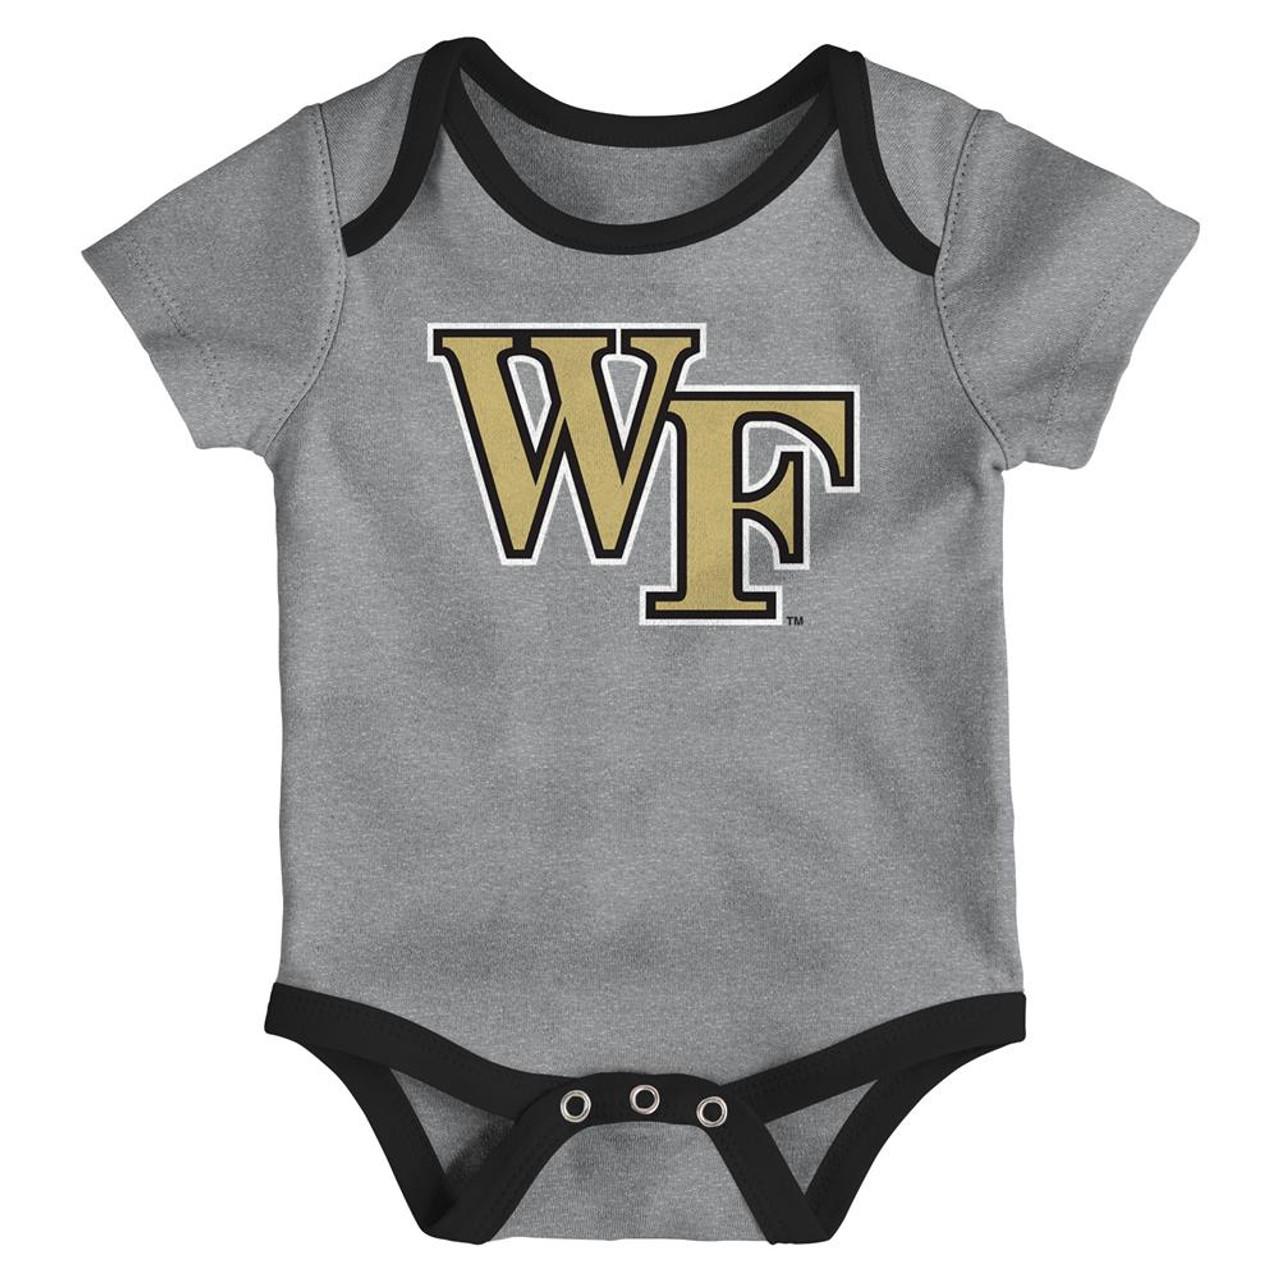 Wake Forest University Infant Creeper Set Lil Tailgater 3 Pack